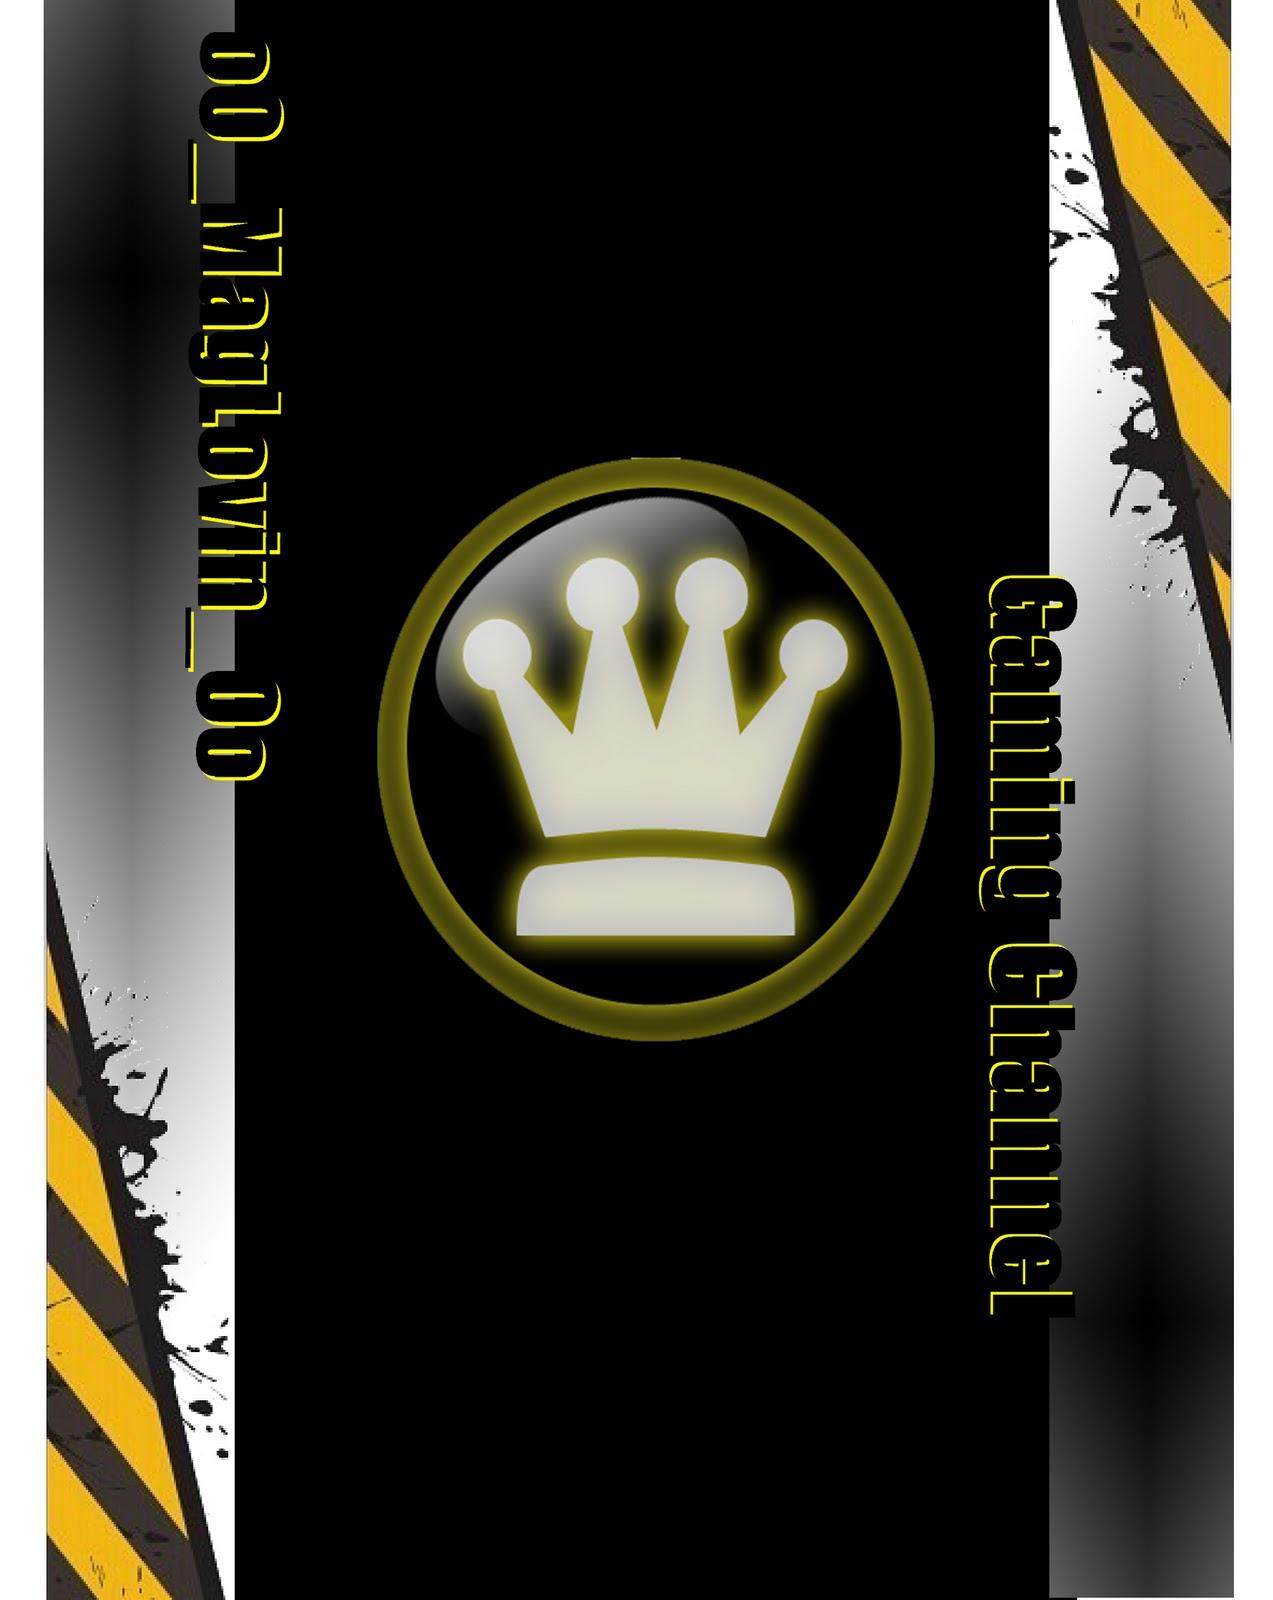 http://4.bp.blogspot.com/-pODtaJHrw8Q/TvG2e3u_kjI/AAAAAAAAAE4/NqHLh-dndsM/s1600/youtube+project.jpg